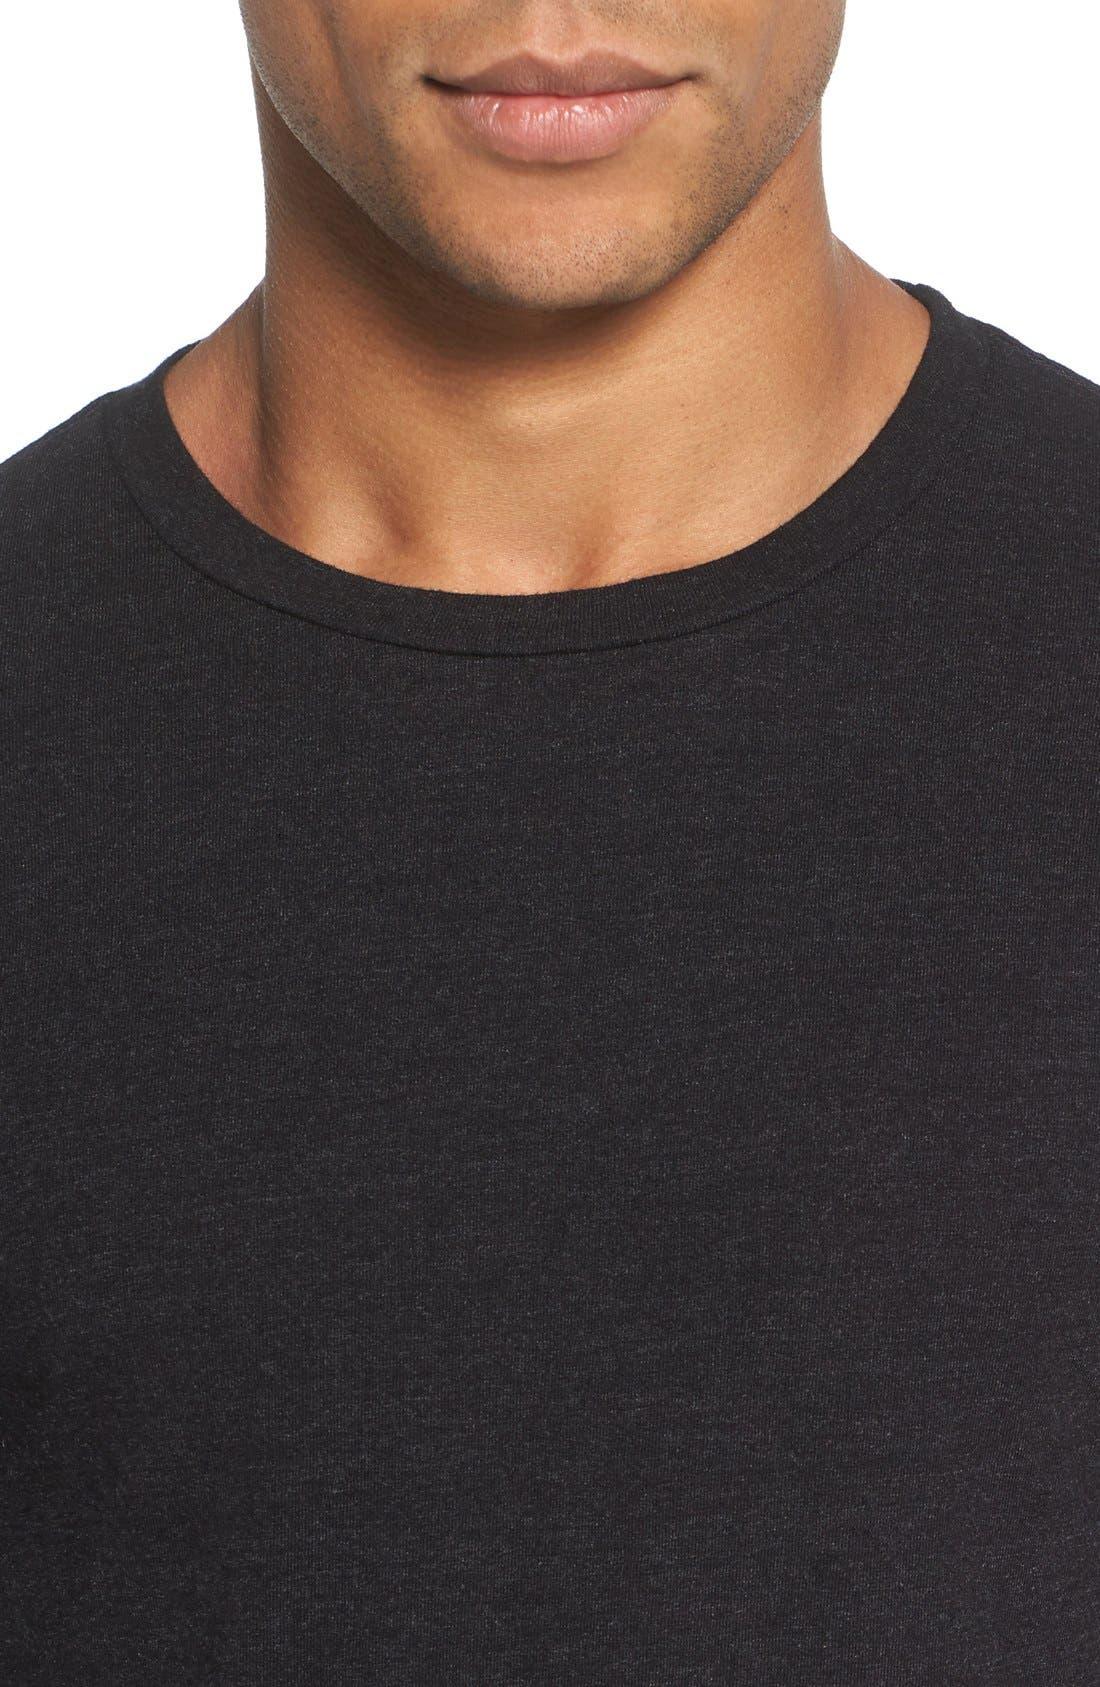 Triblend Scallop Long Sleeve Crewneck T-Shirt,                             Alternate thumbnail 2, color,                             BLACK